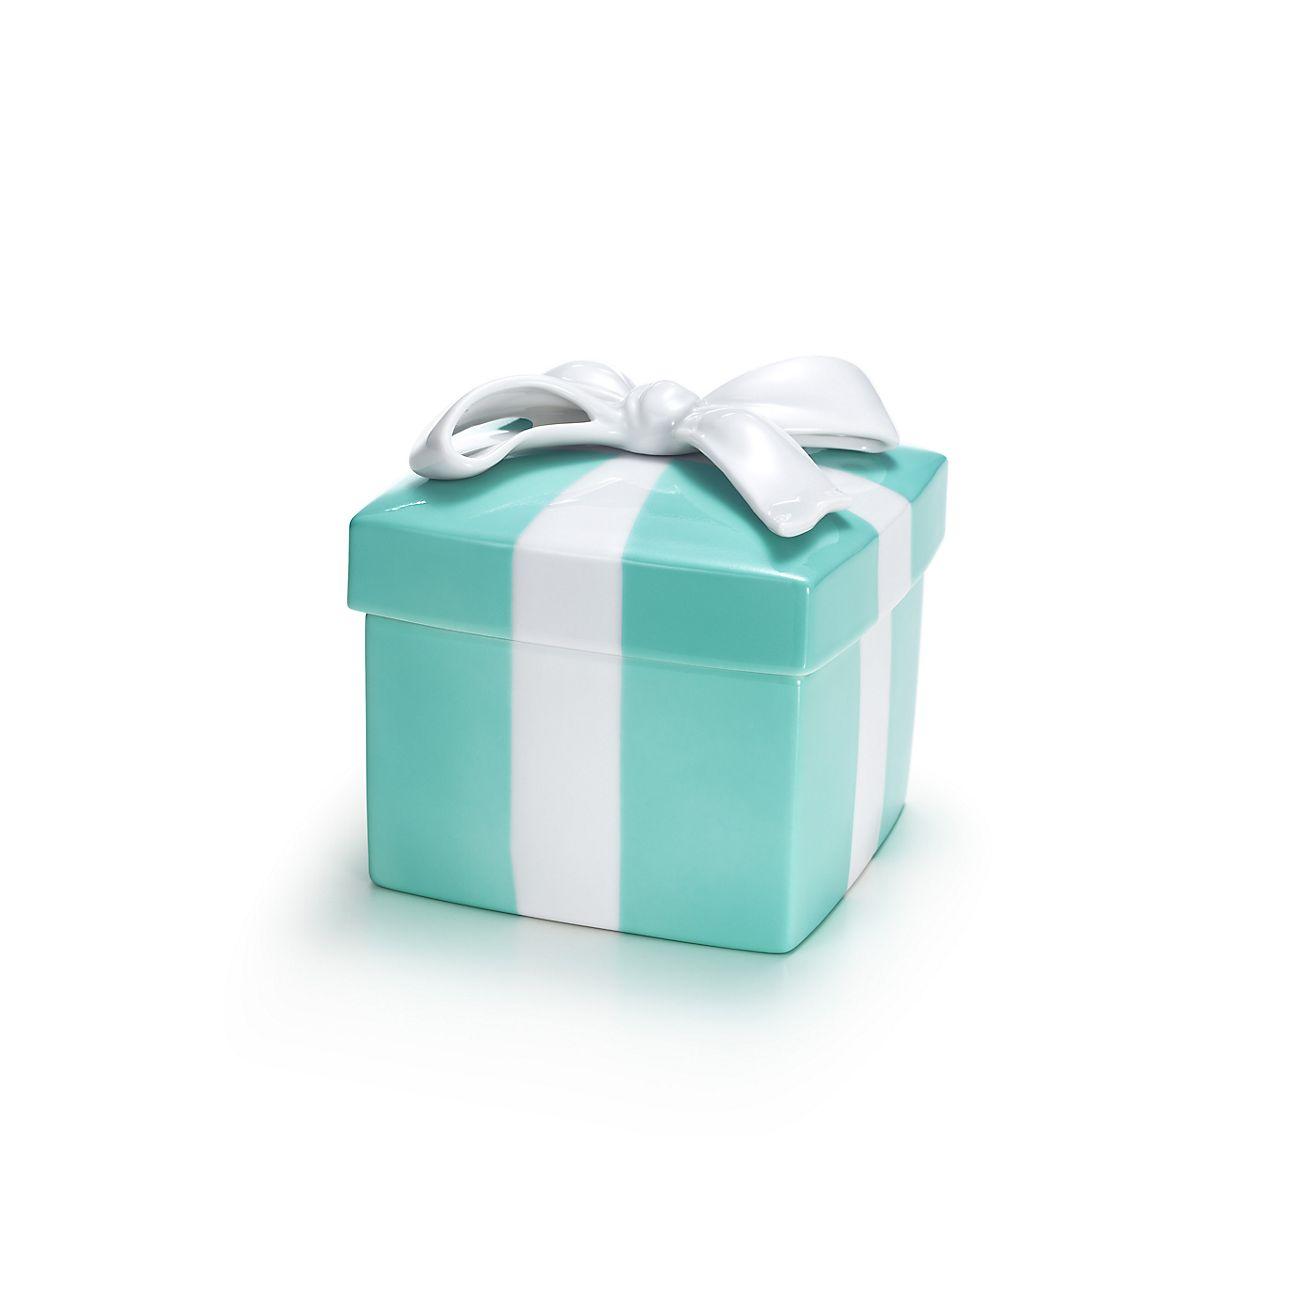 Tiffany & co kette kaufen